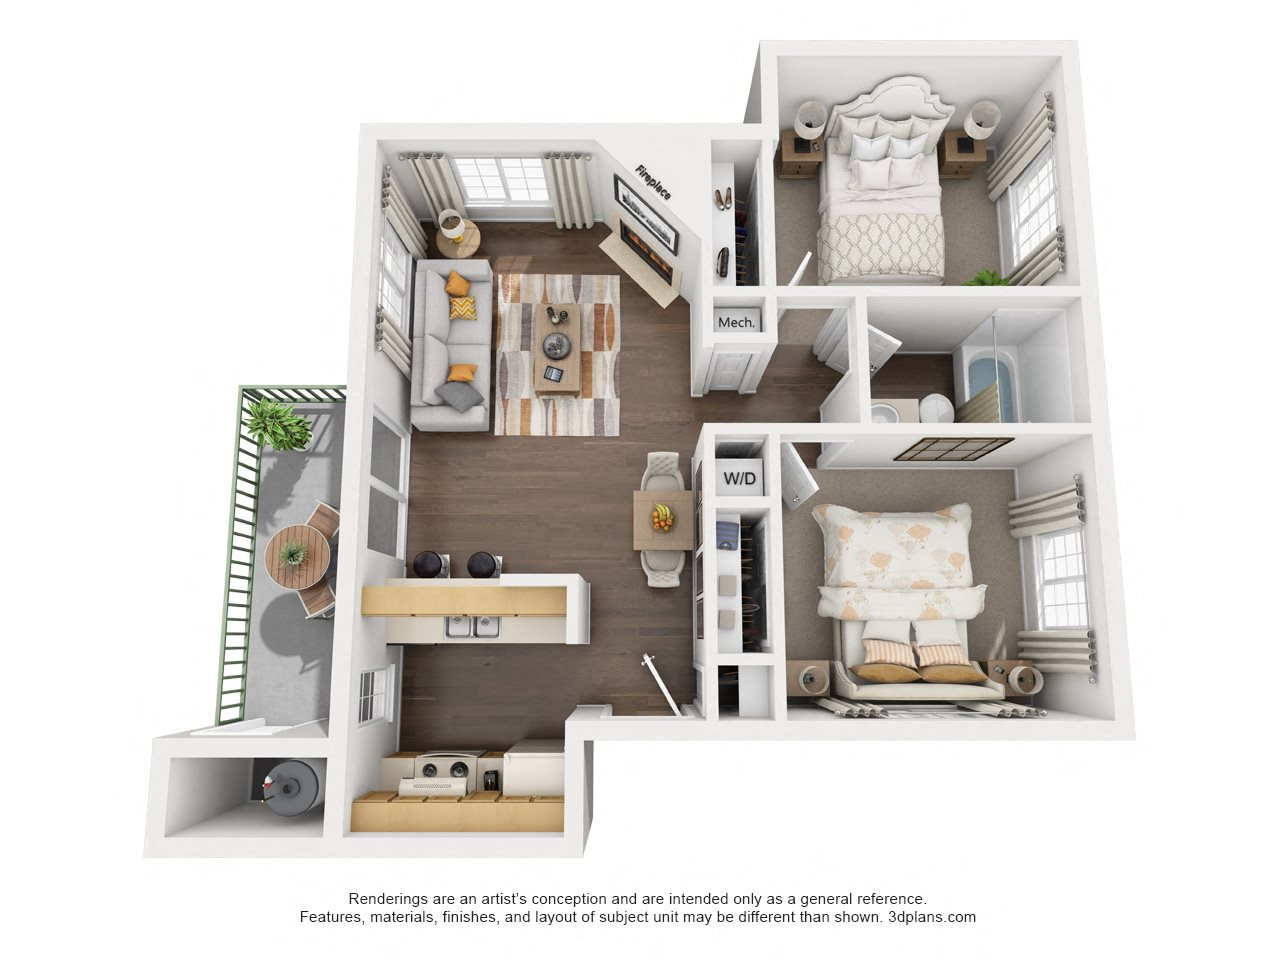 2 Bedroom, 1 Bath, Downstairs Floor Plan 3